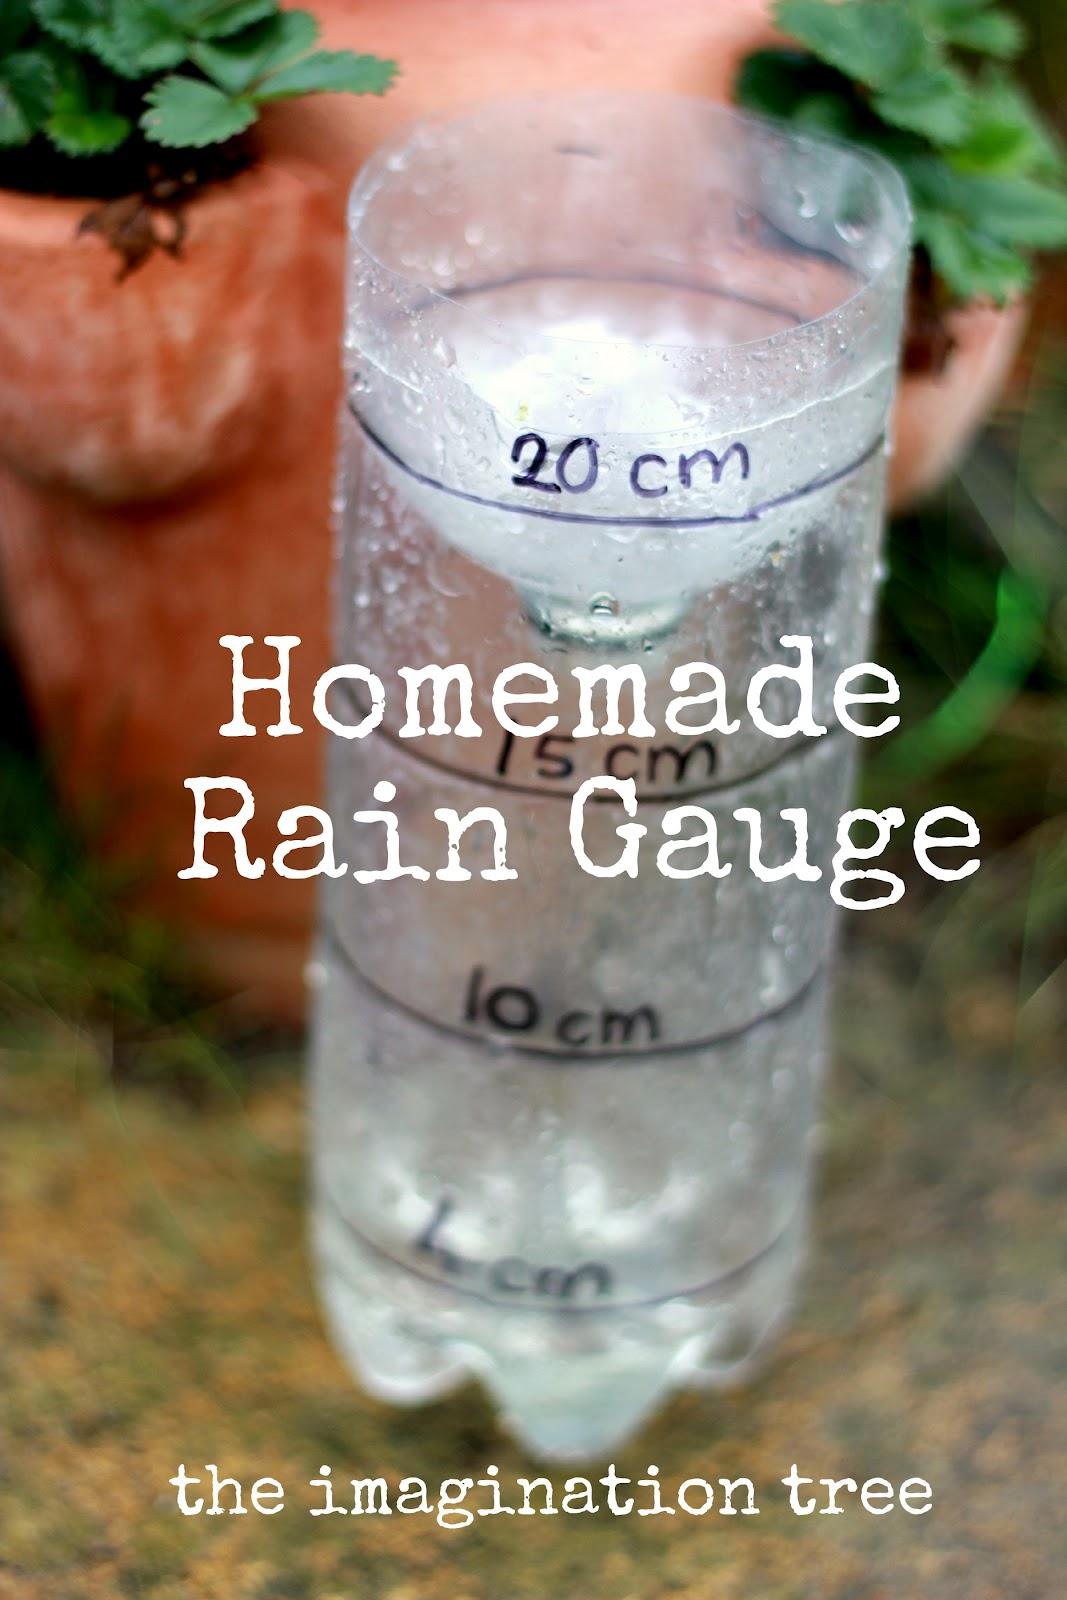 Homemade Rain Gauge